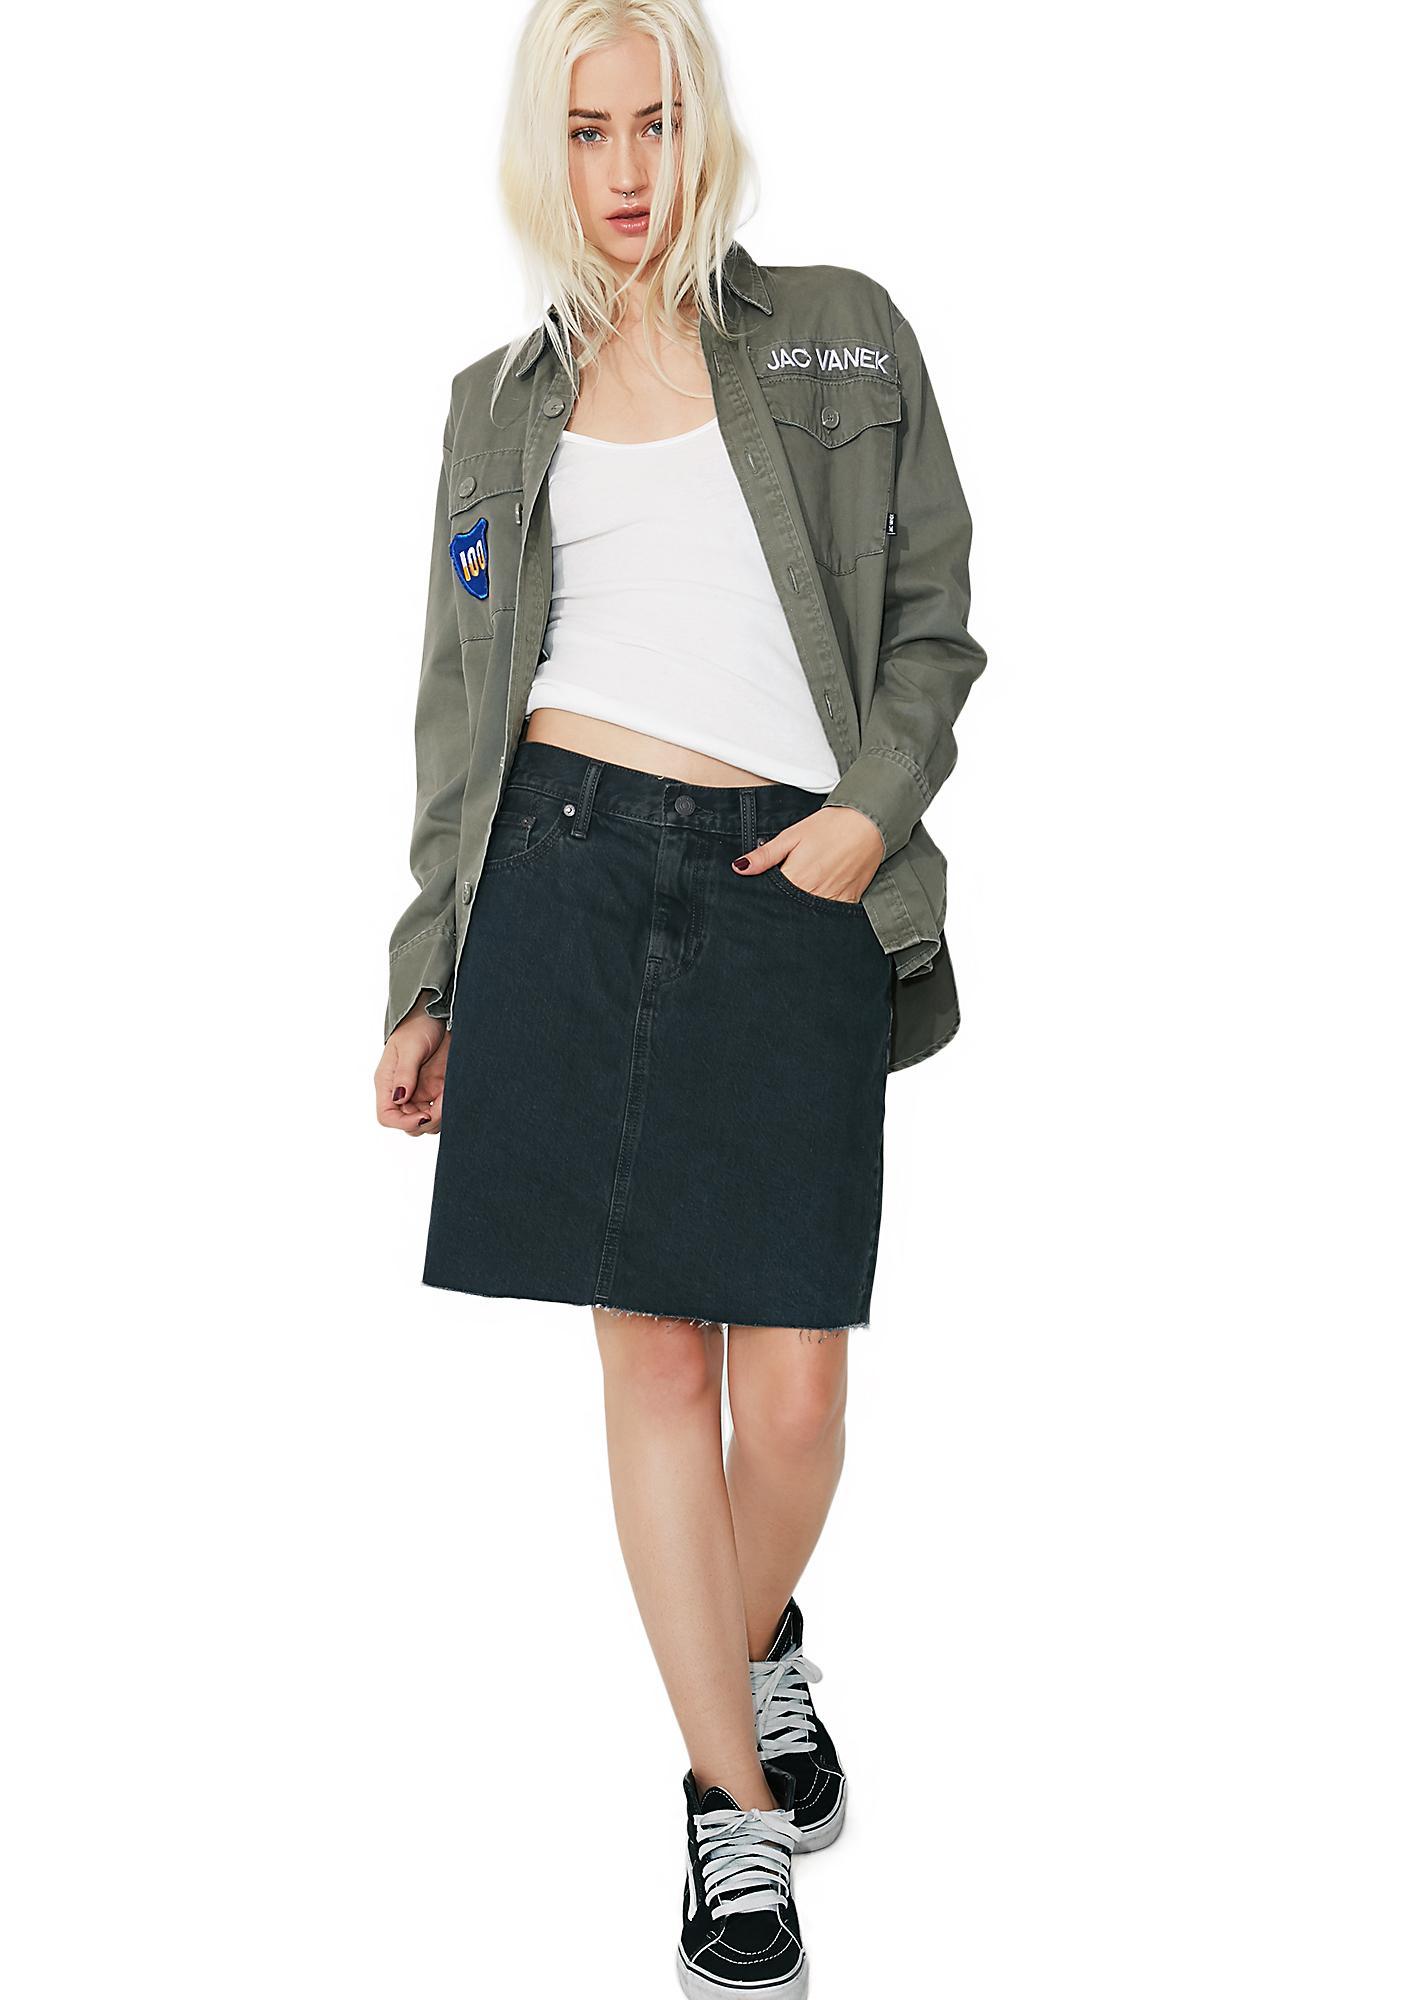 Levis Everyday Skirt